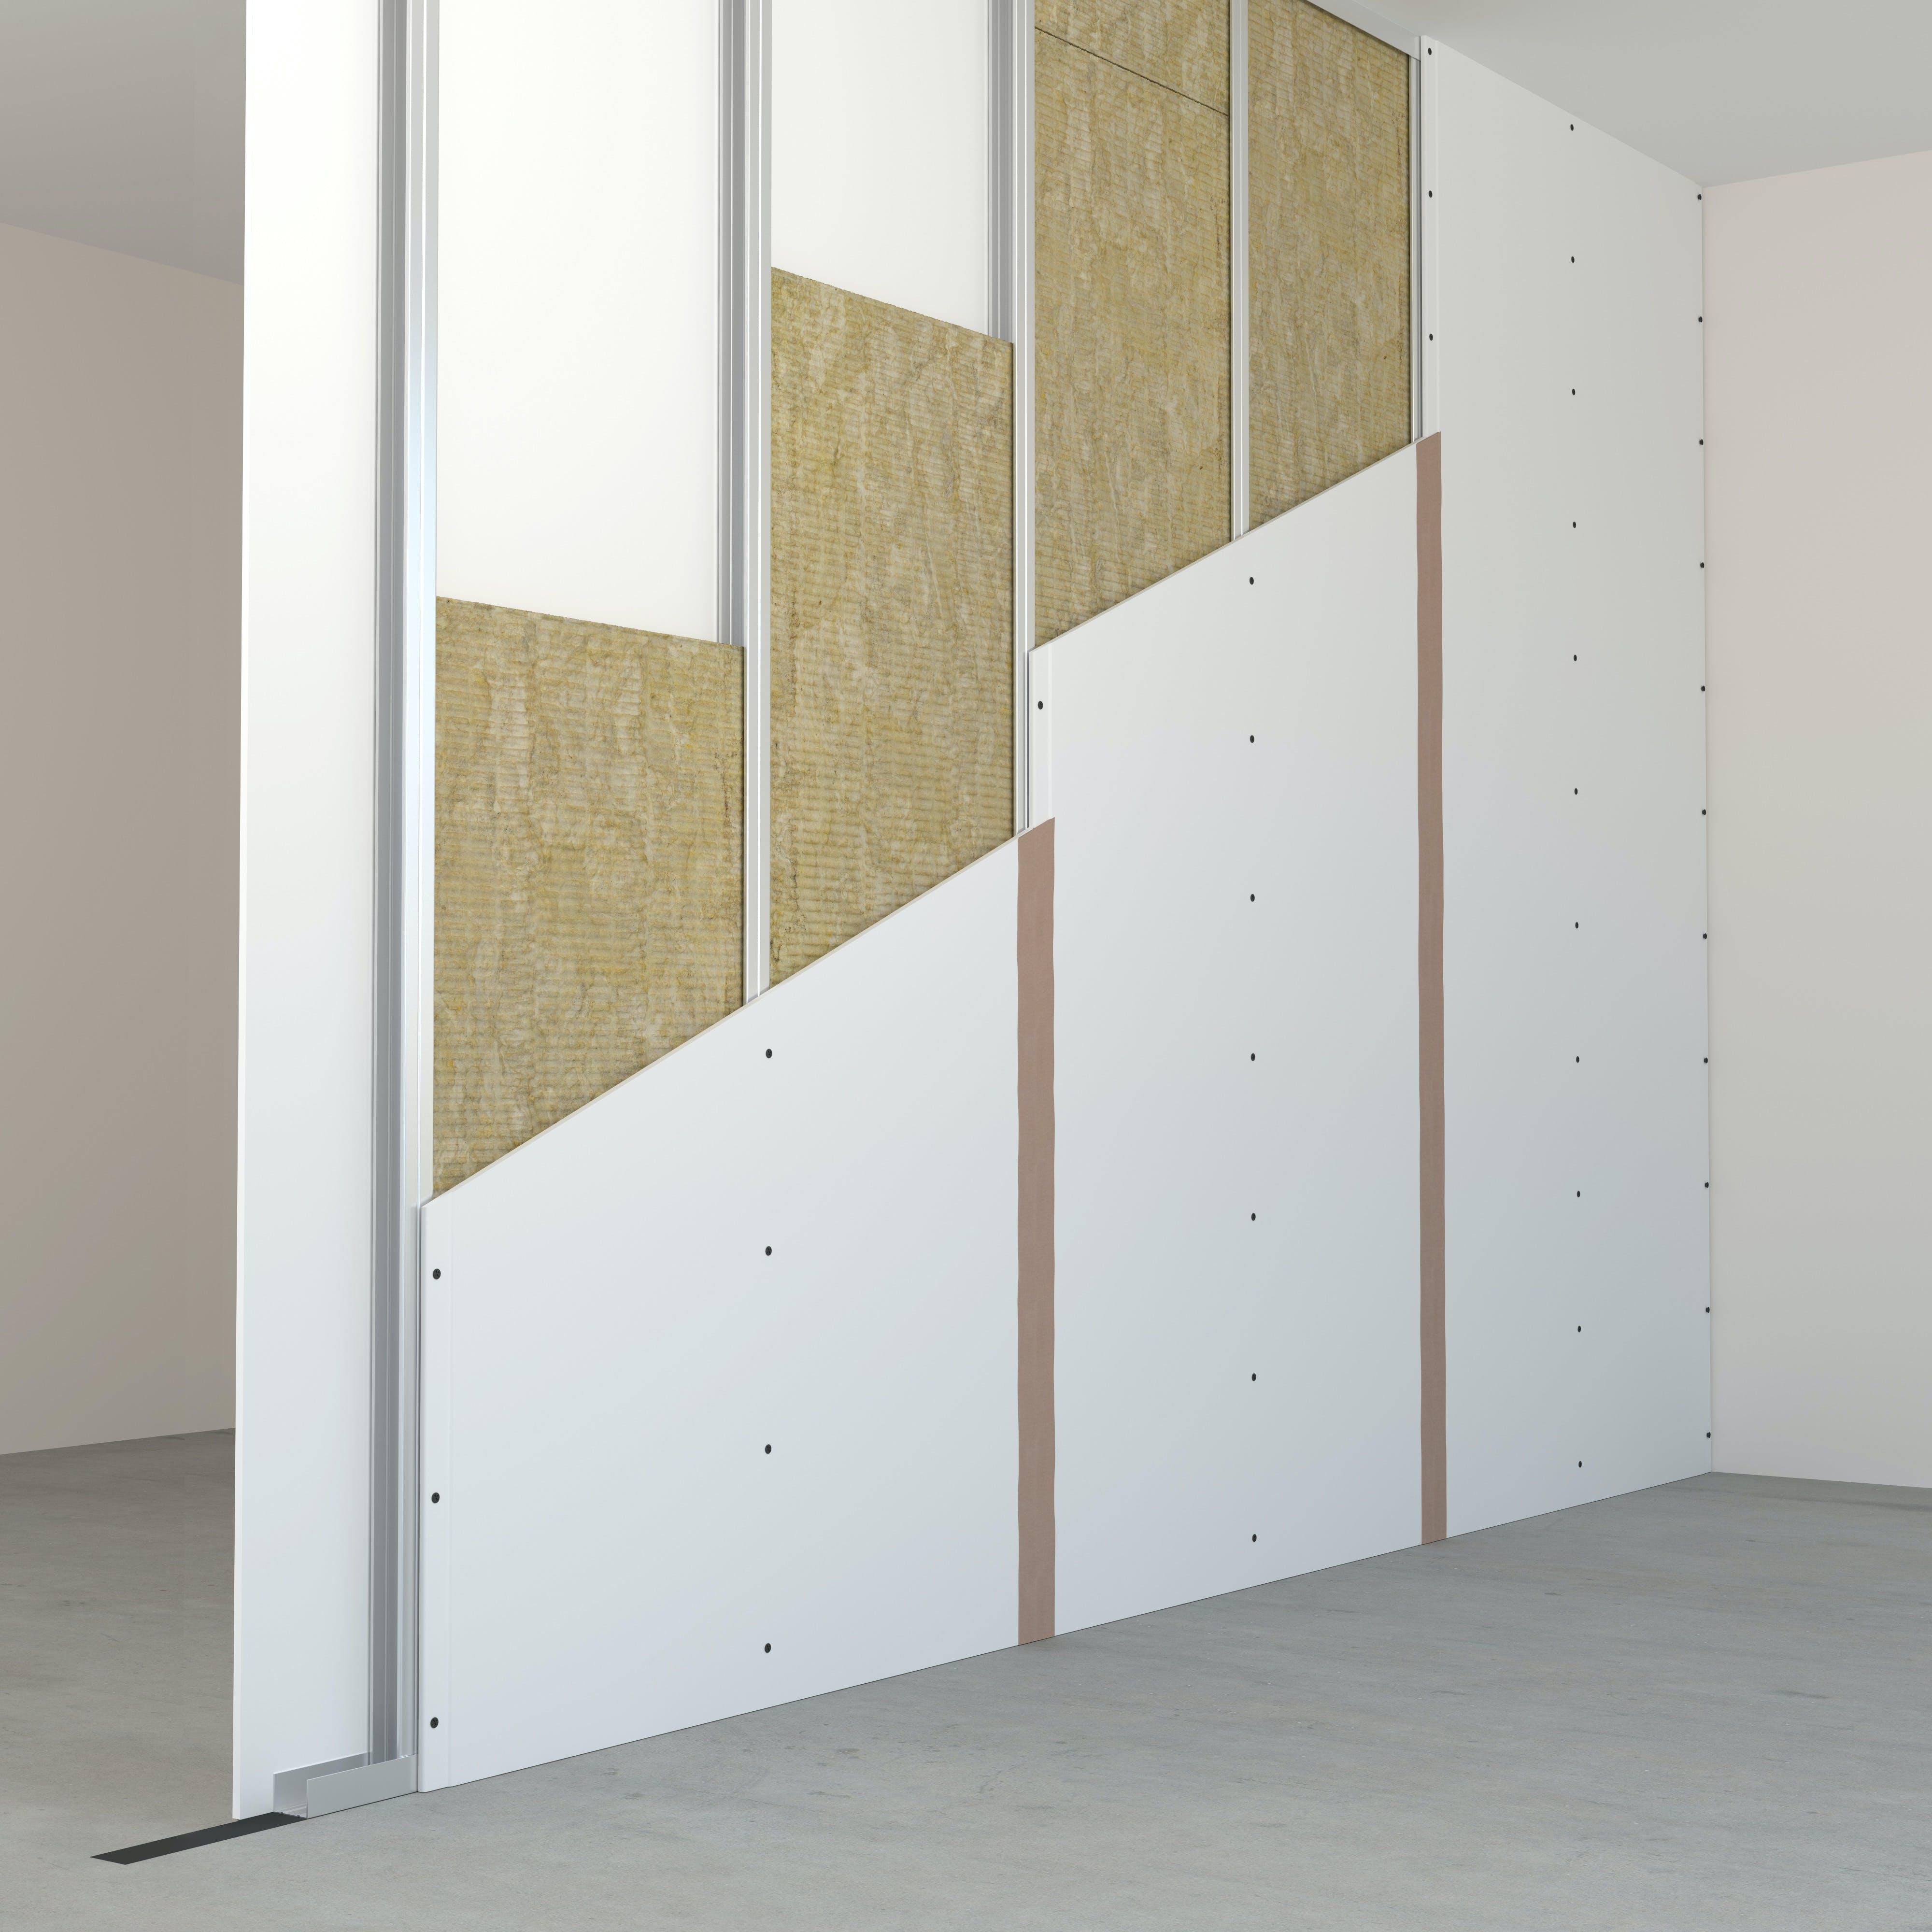 Partition walls, internal insulation